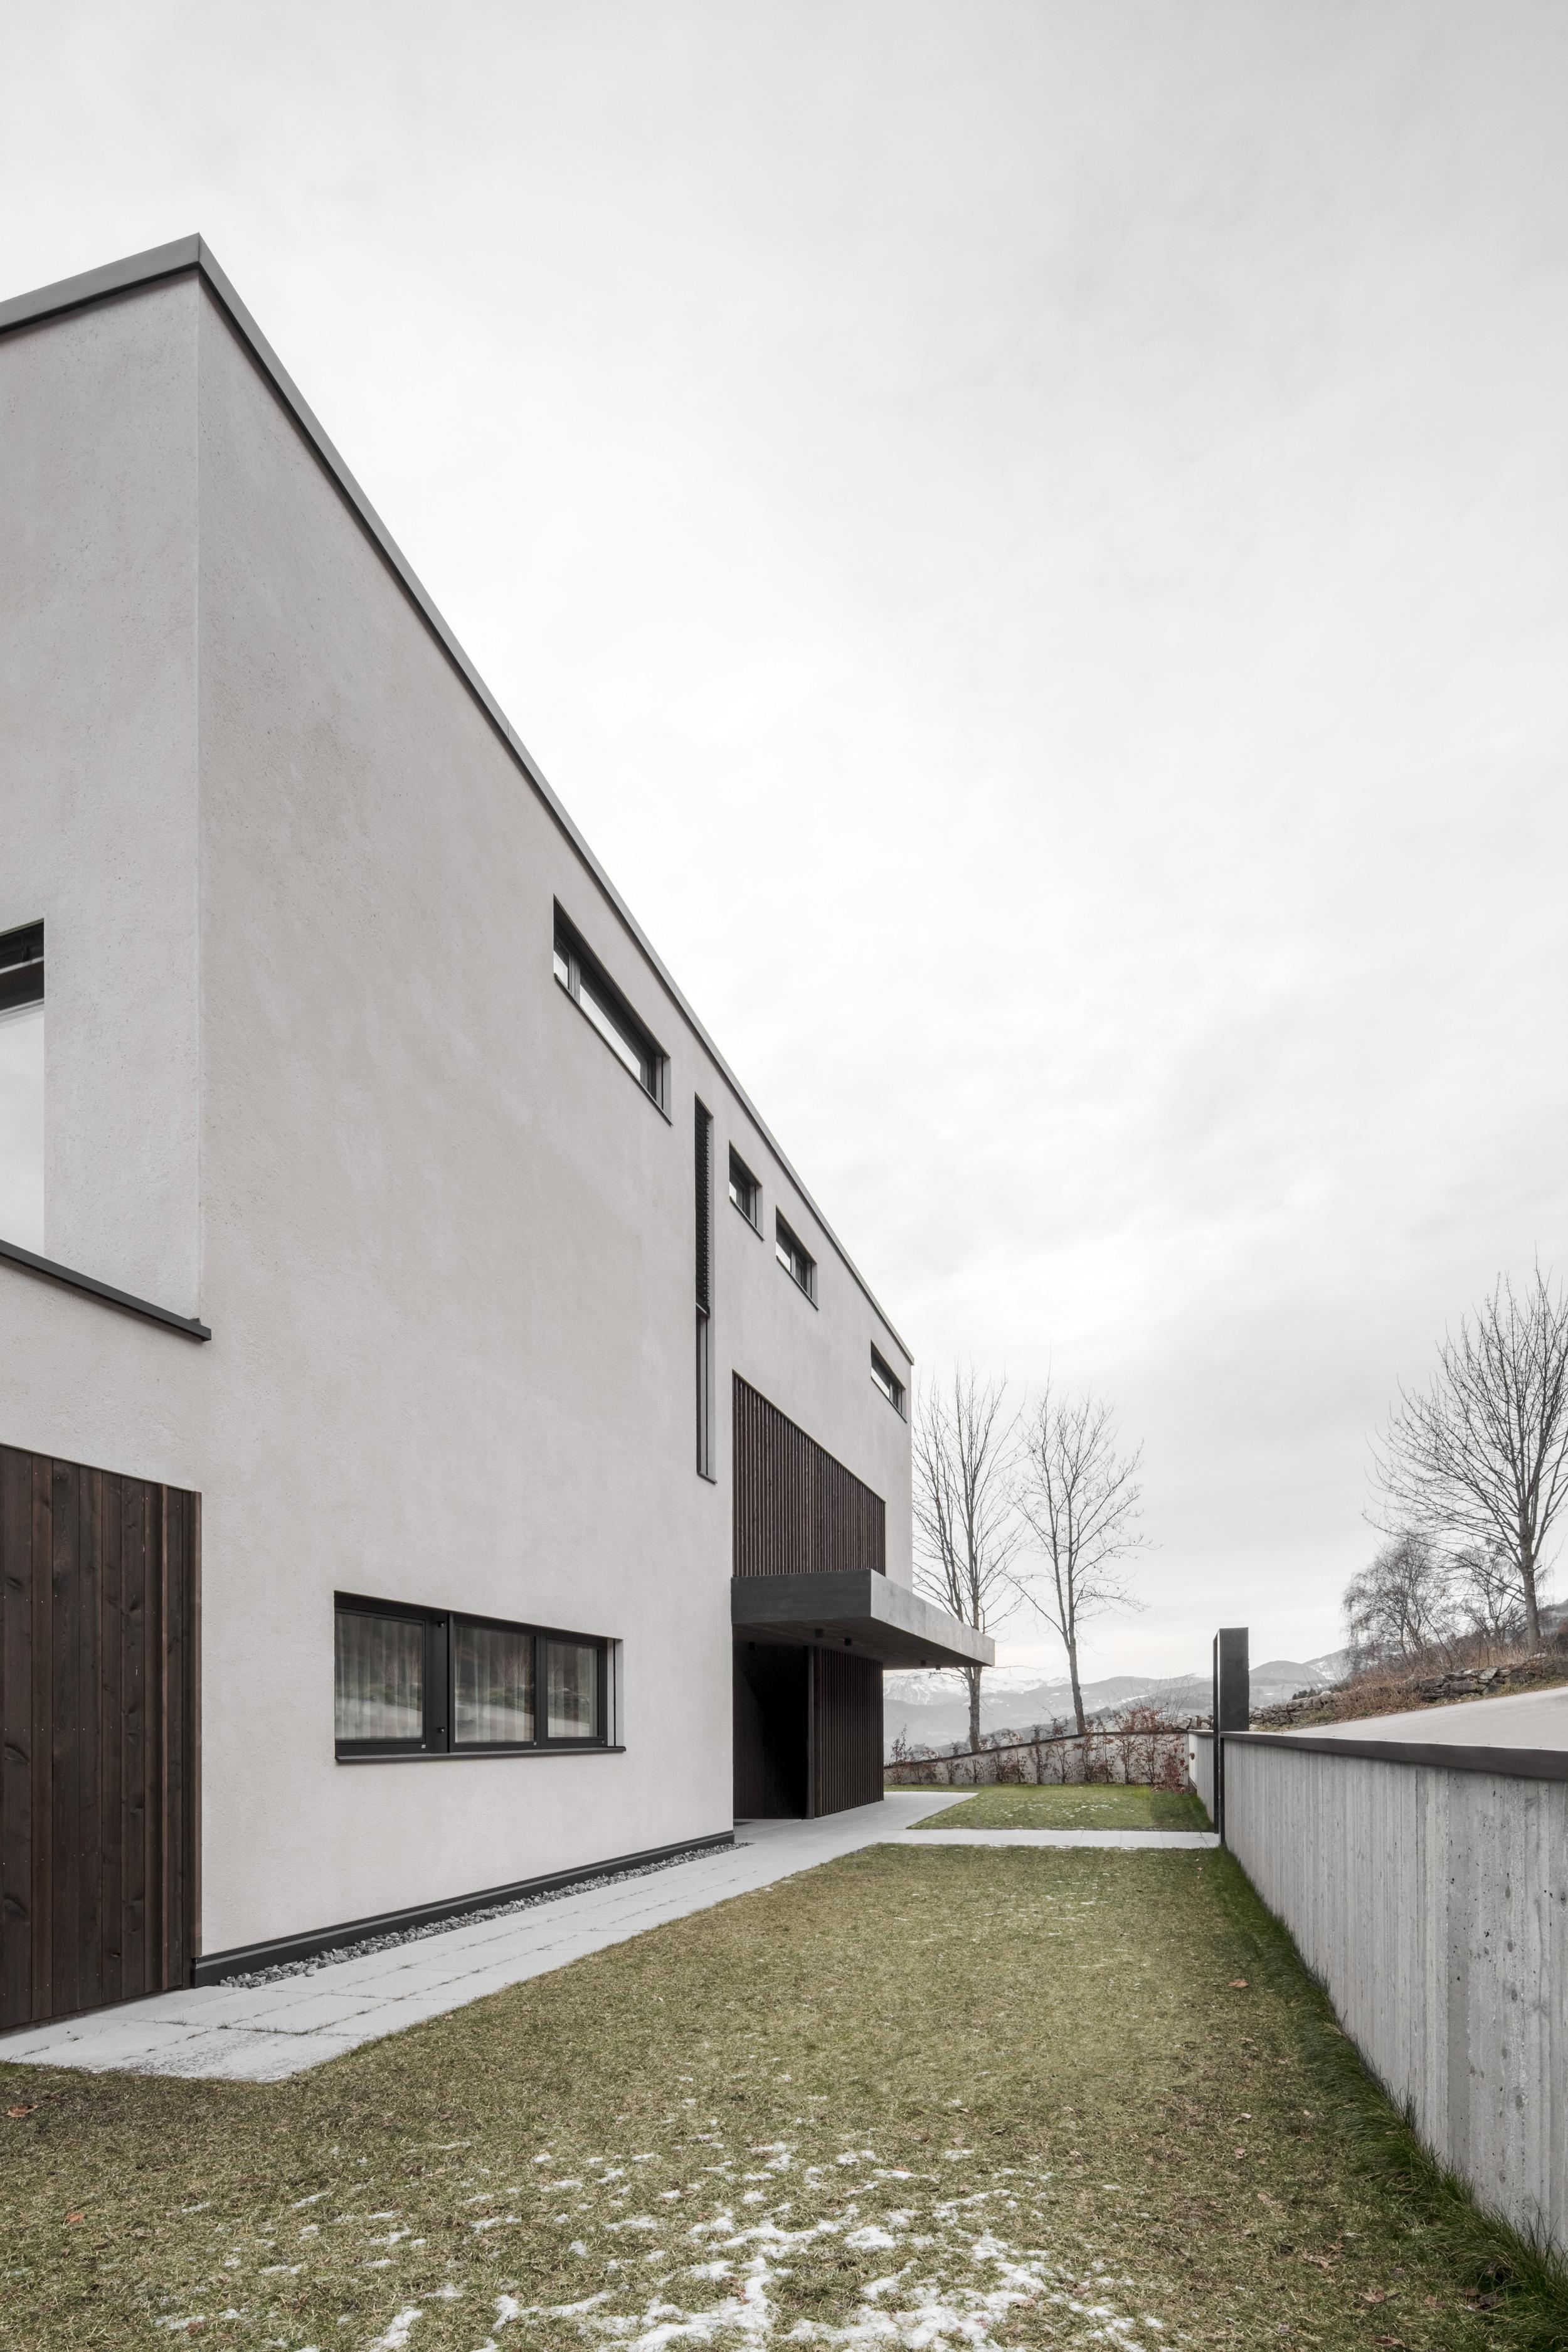 Comfort_Arch-Pfalzen_IMG_4691_GW.jpg